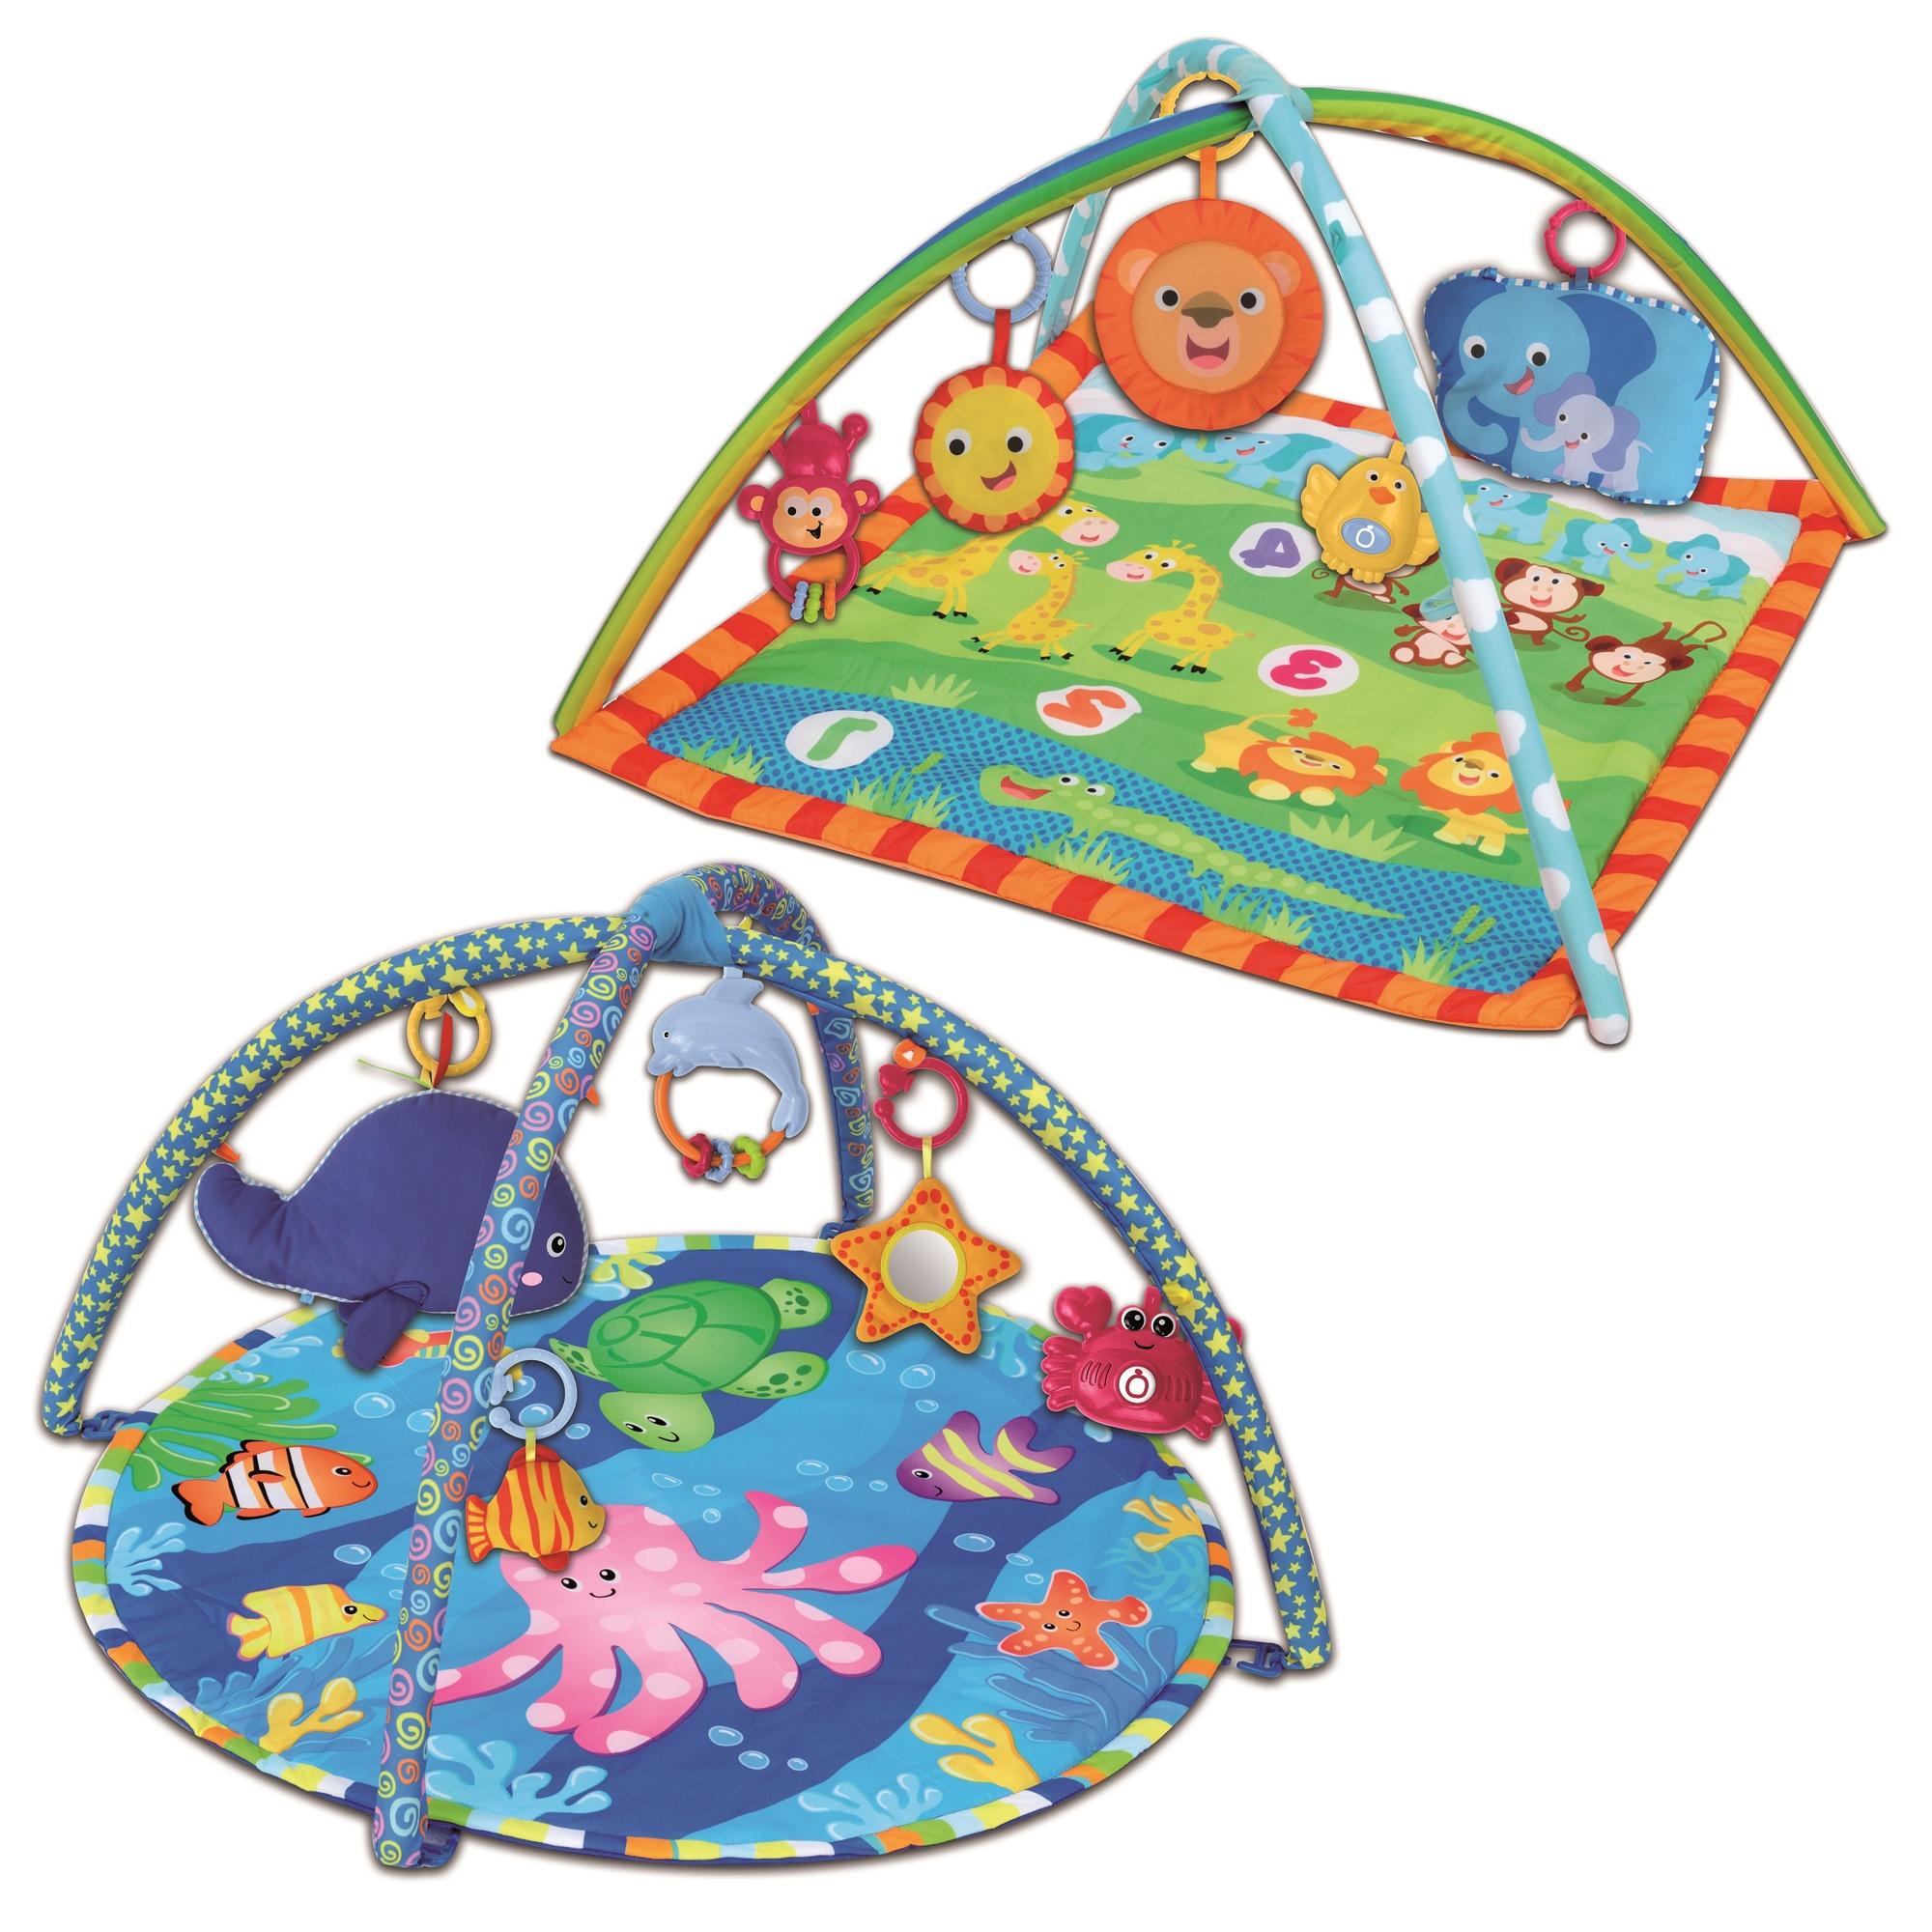 Bontempi Square Jungle Play Mat Musical Sound Baby Soft